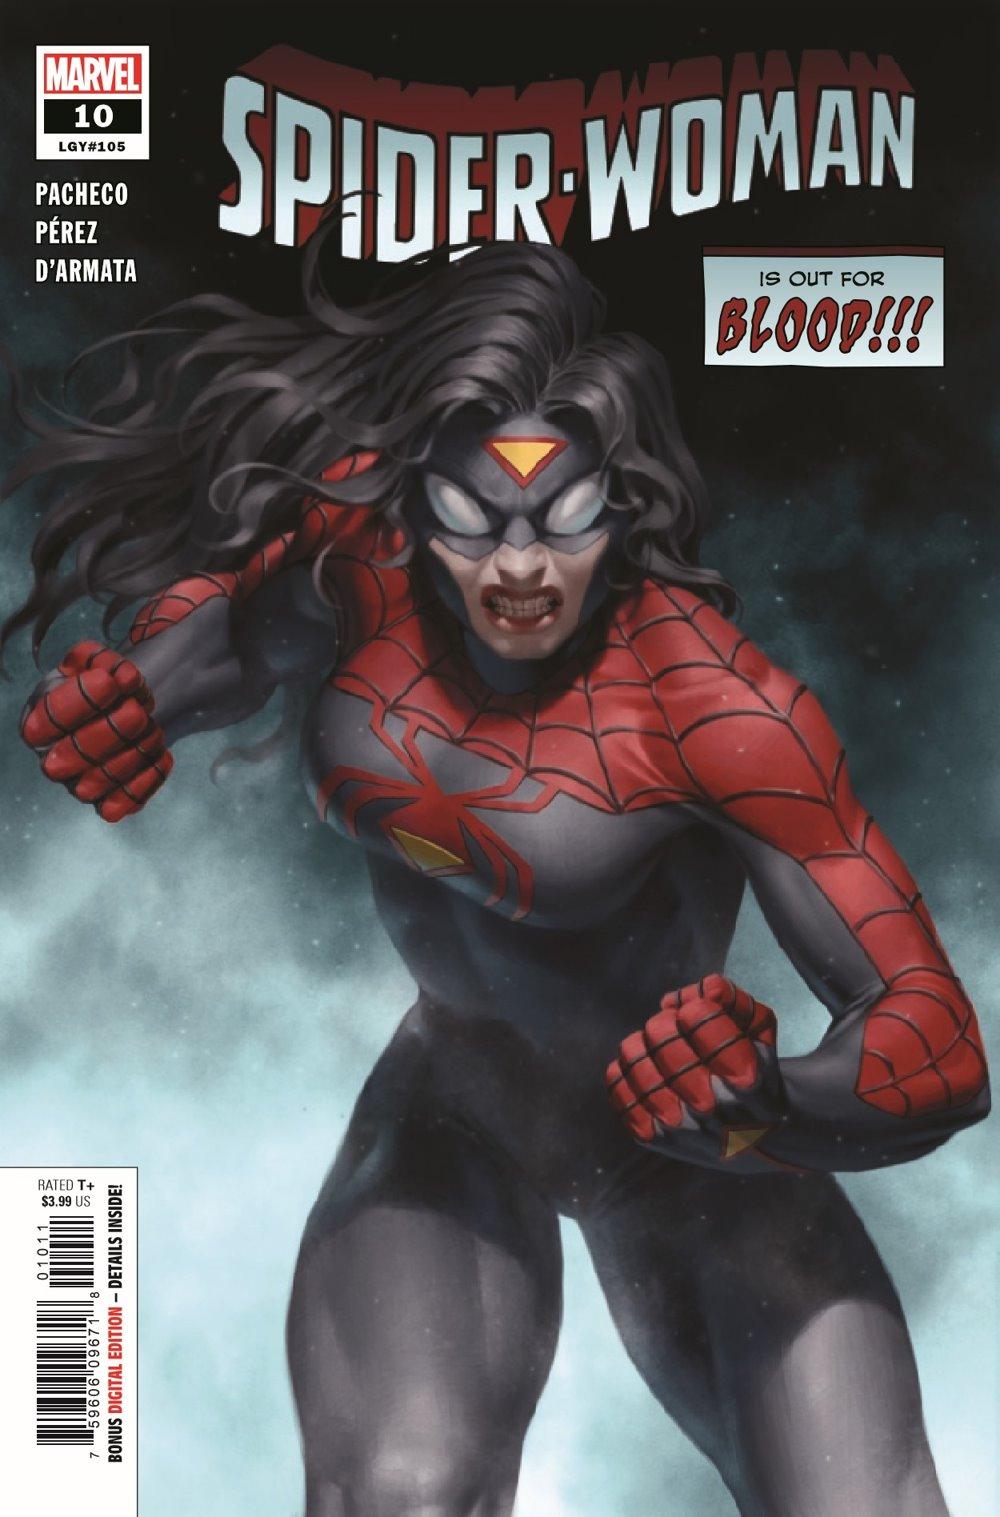 SWOMAN2020010_Preview-1 ComicList Previews: SPIDER-WOMAN #10